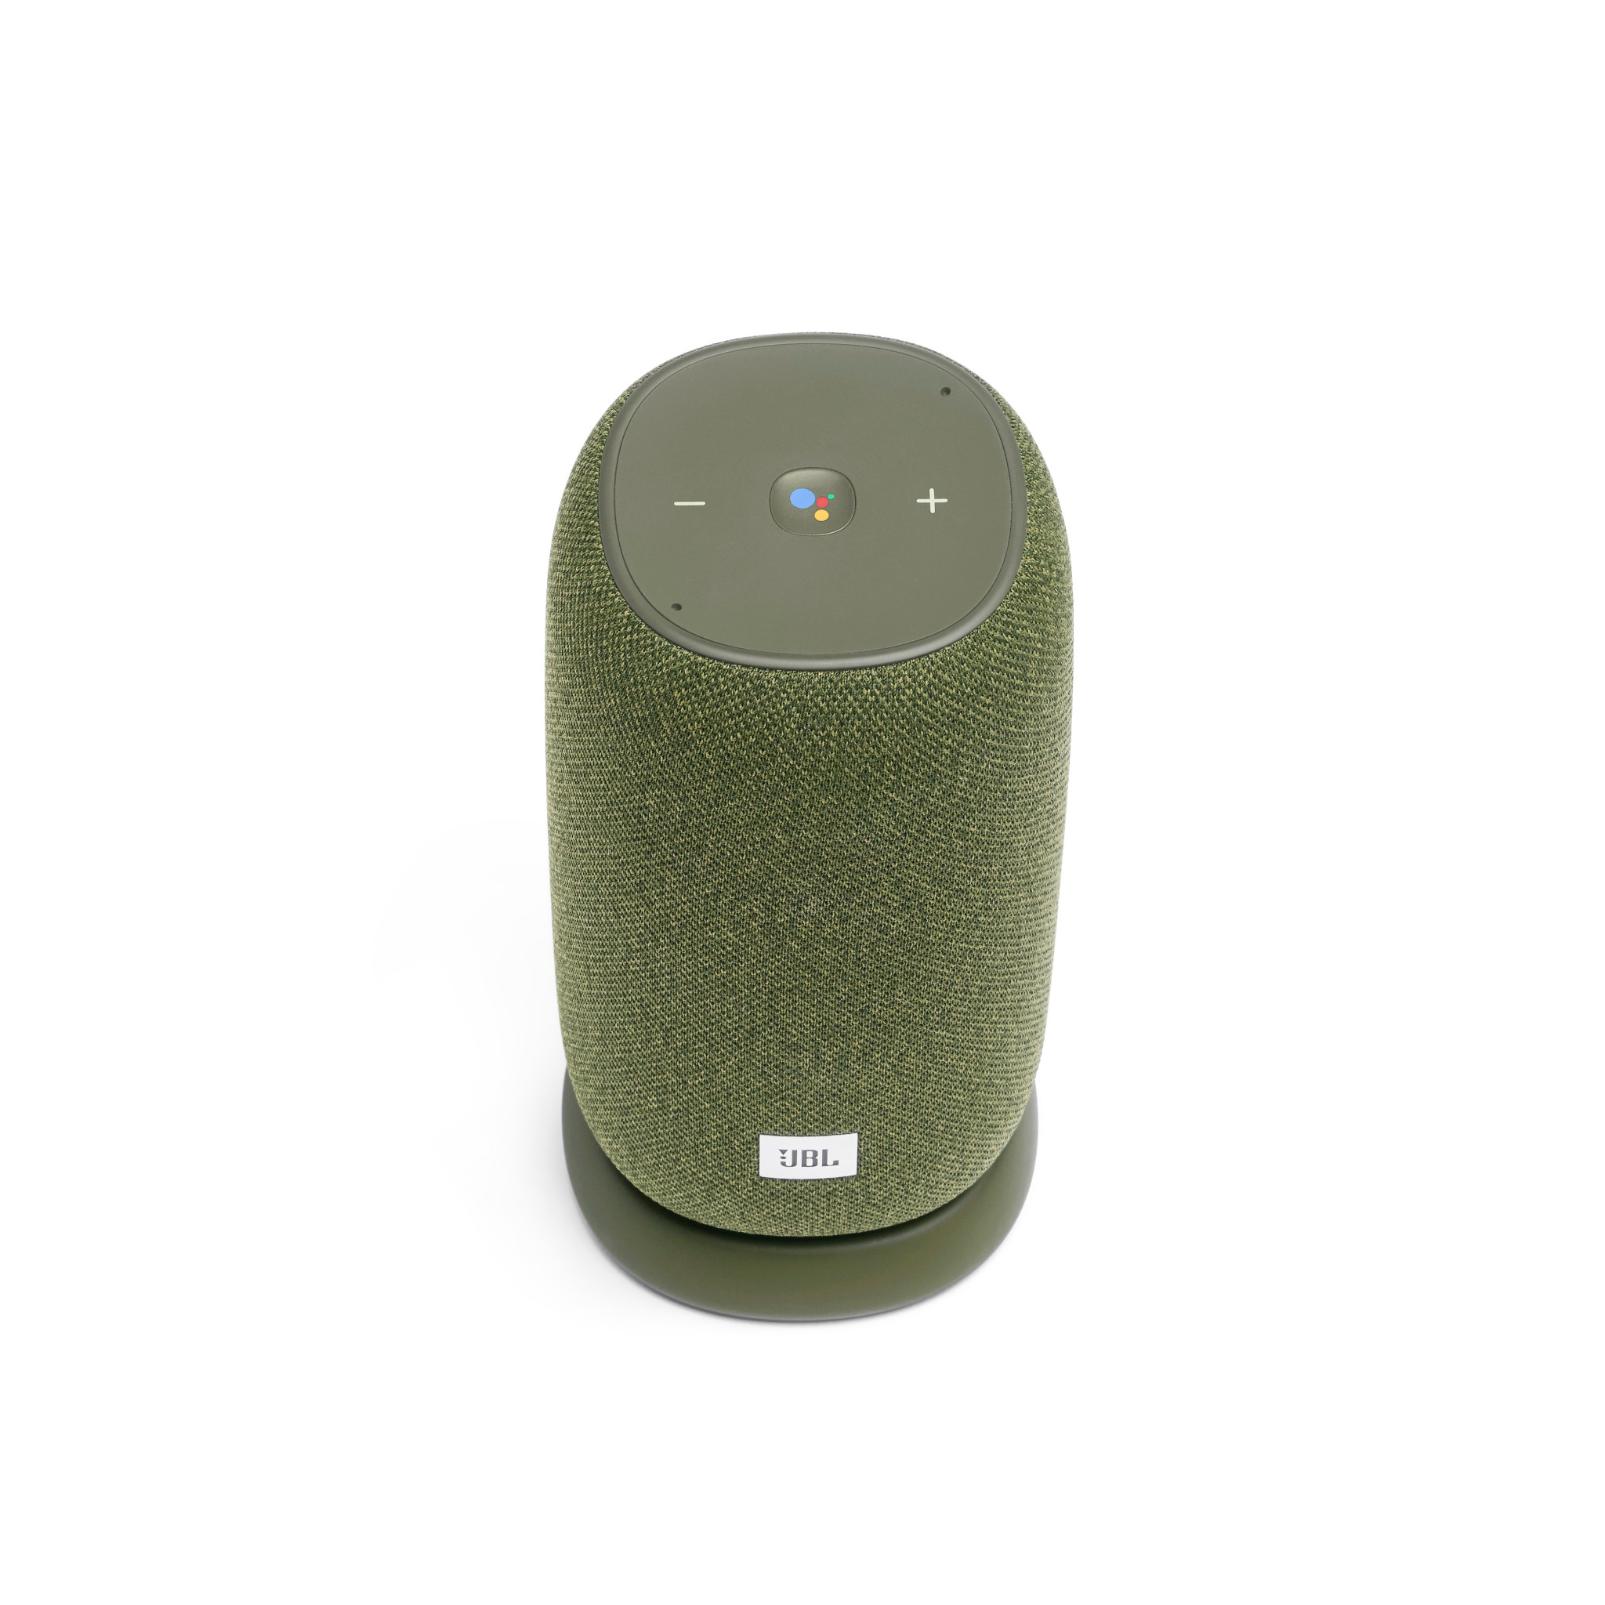 JBL Link Portable - Green - Portable Wi-Fi Speaker - Front